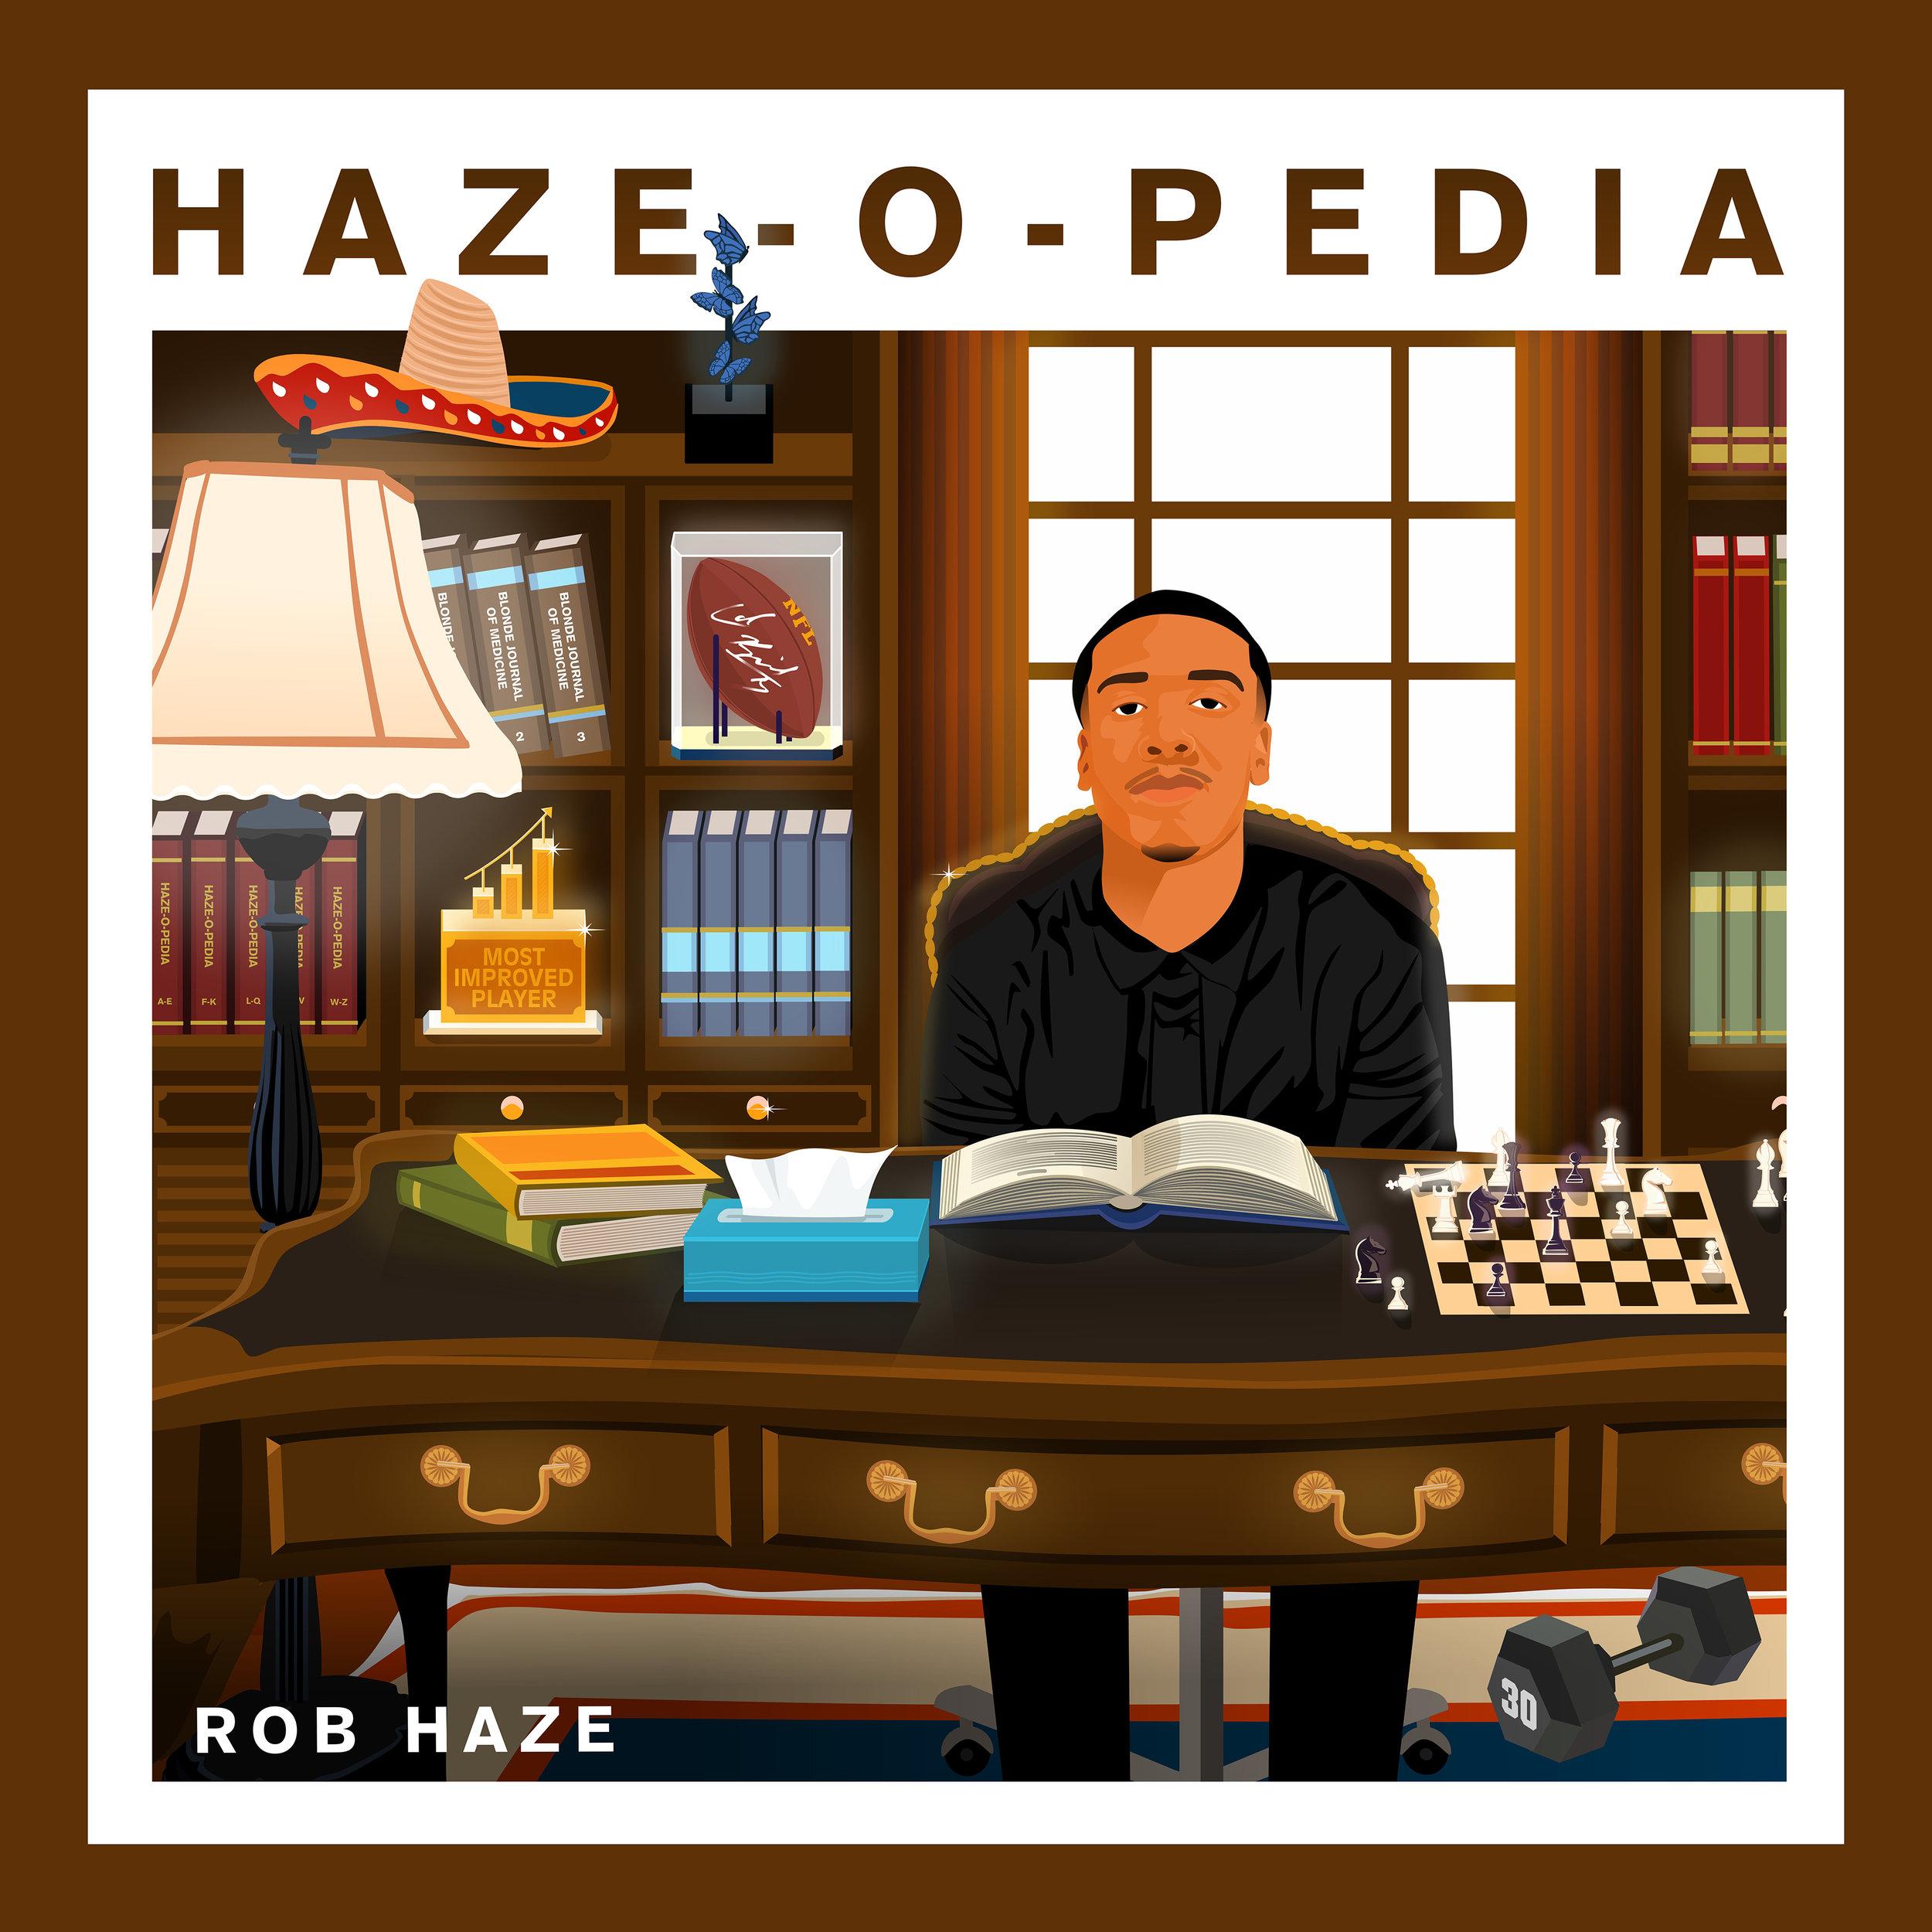 Rob Haze - Haze-O-Pedia Digital Art.jpg